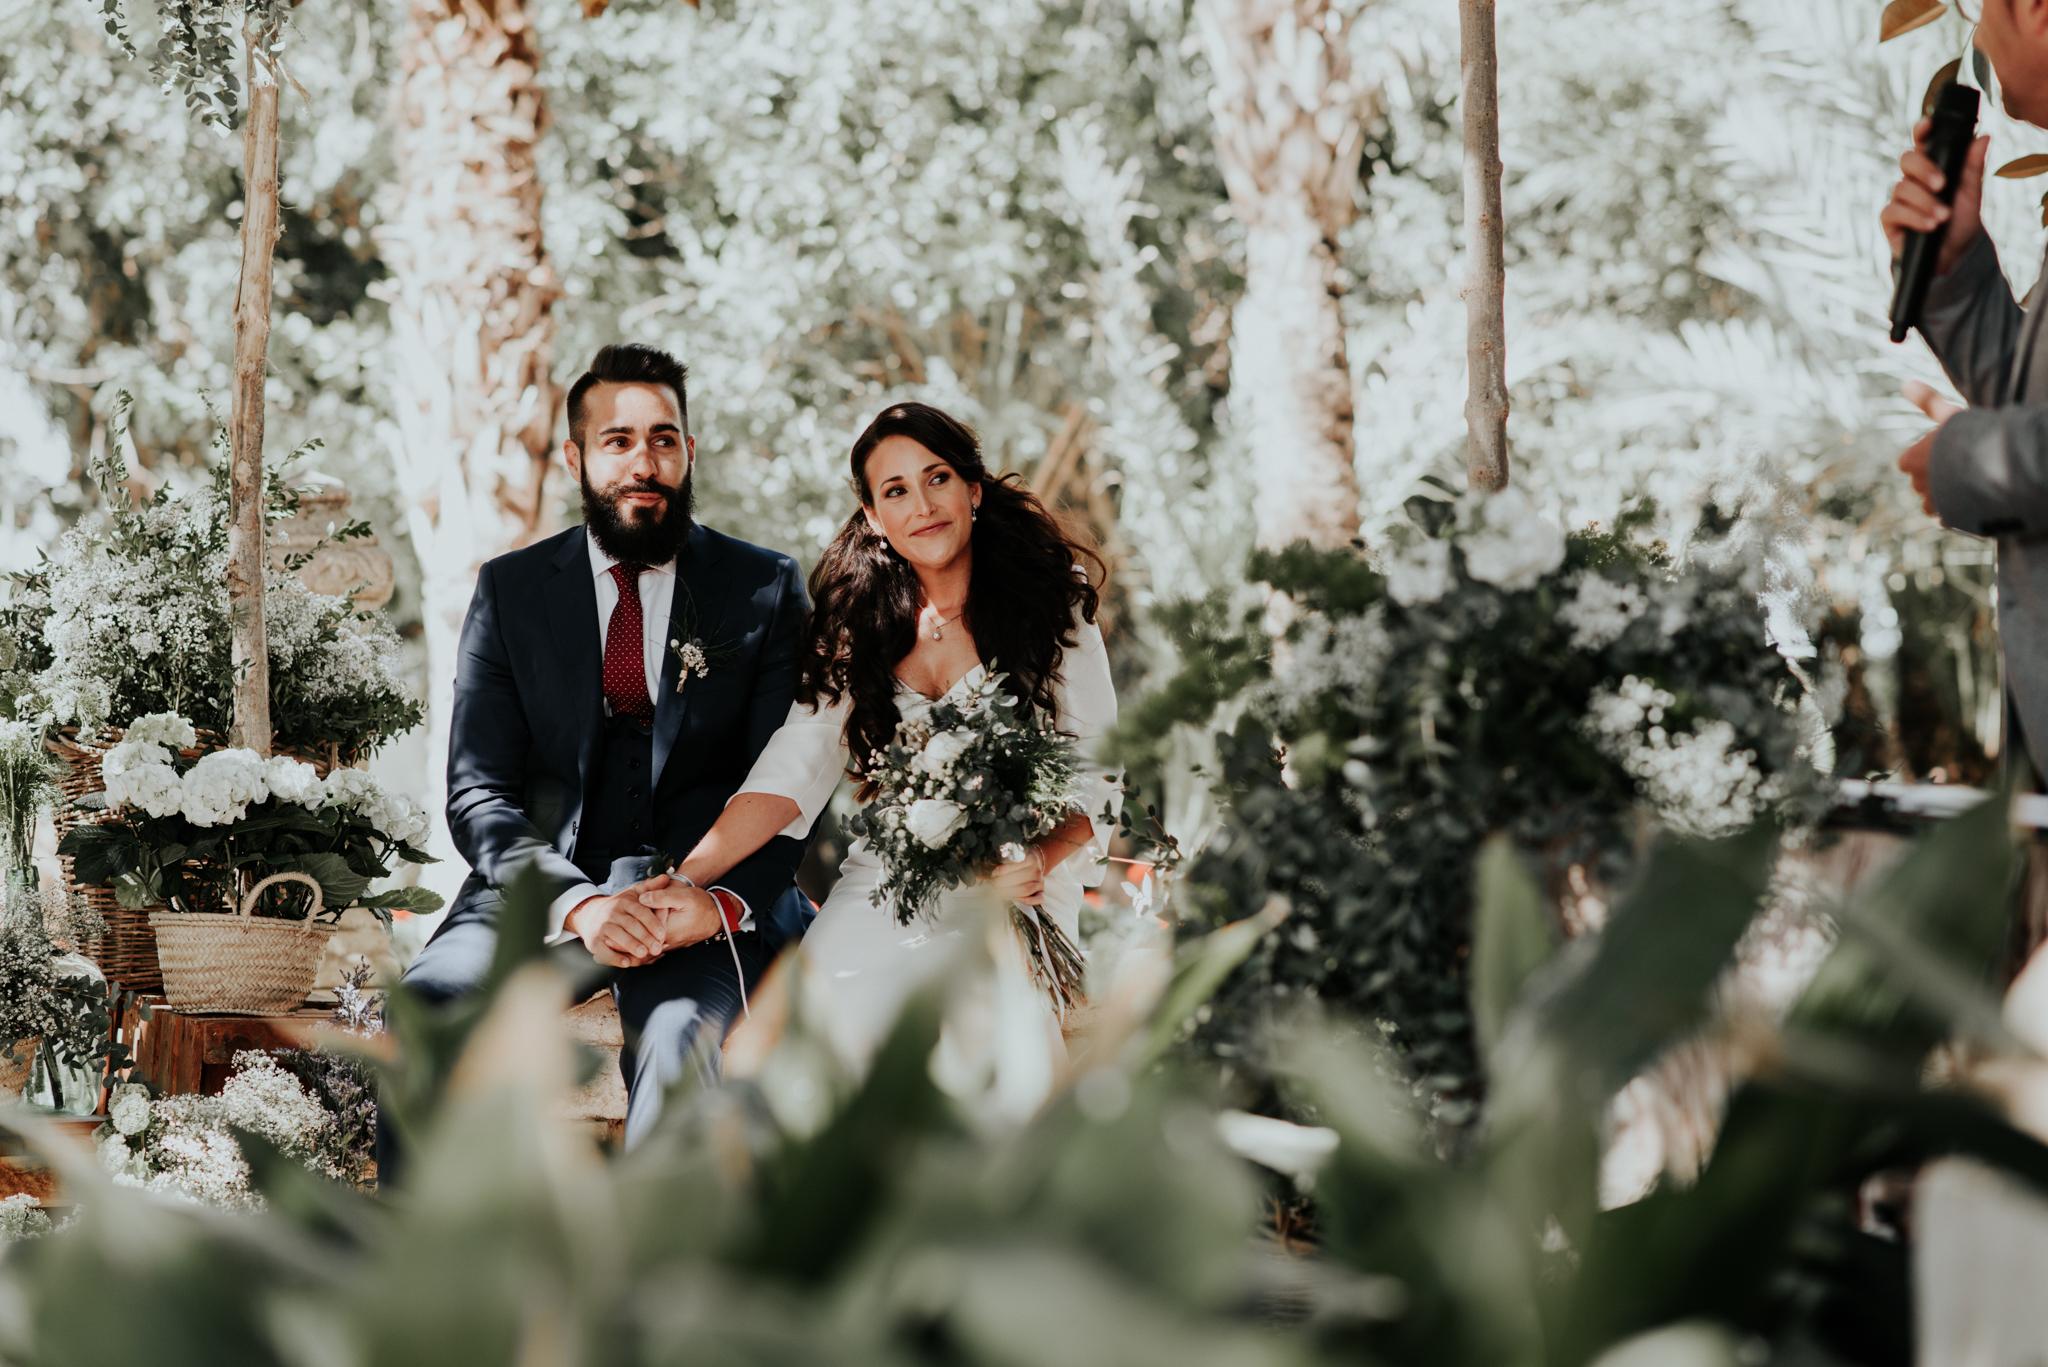 Dia+boda+Lupe+y+David-206.jpg